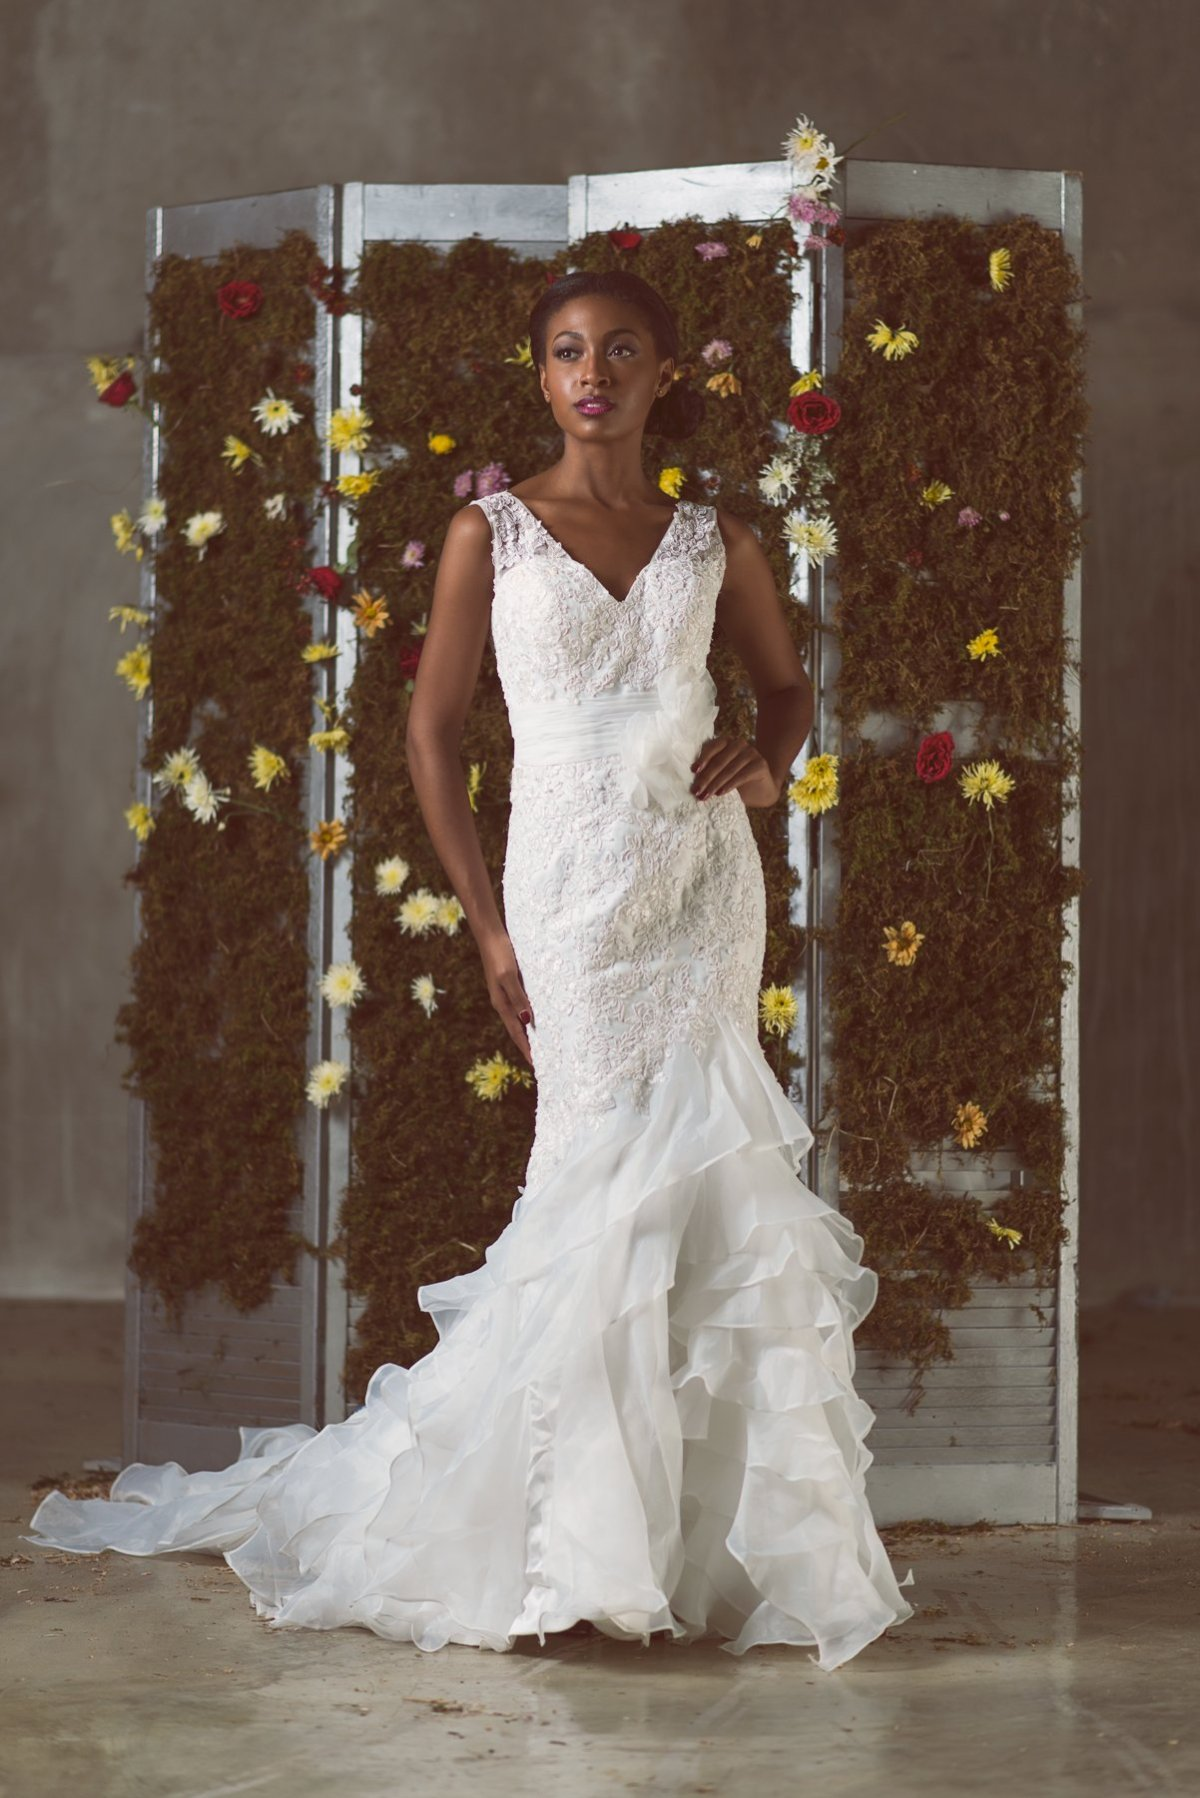 Custom Wedding Dress Brooklyn Ny - raveitsafe